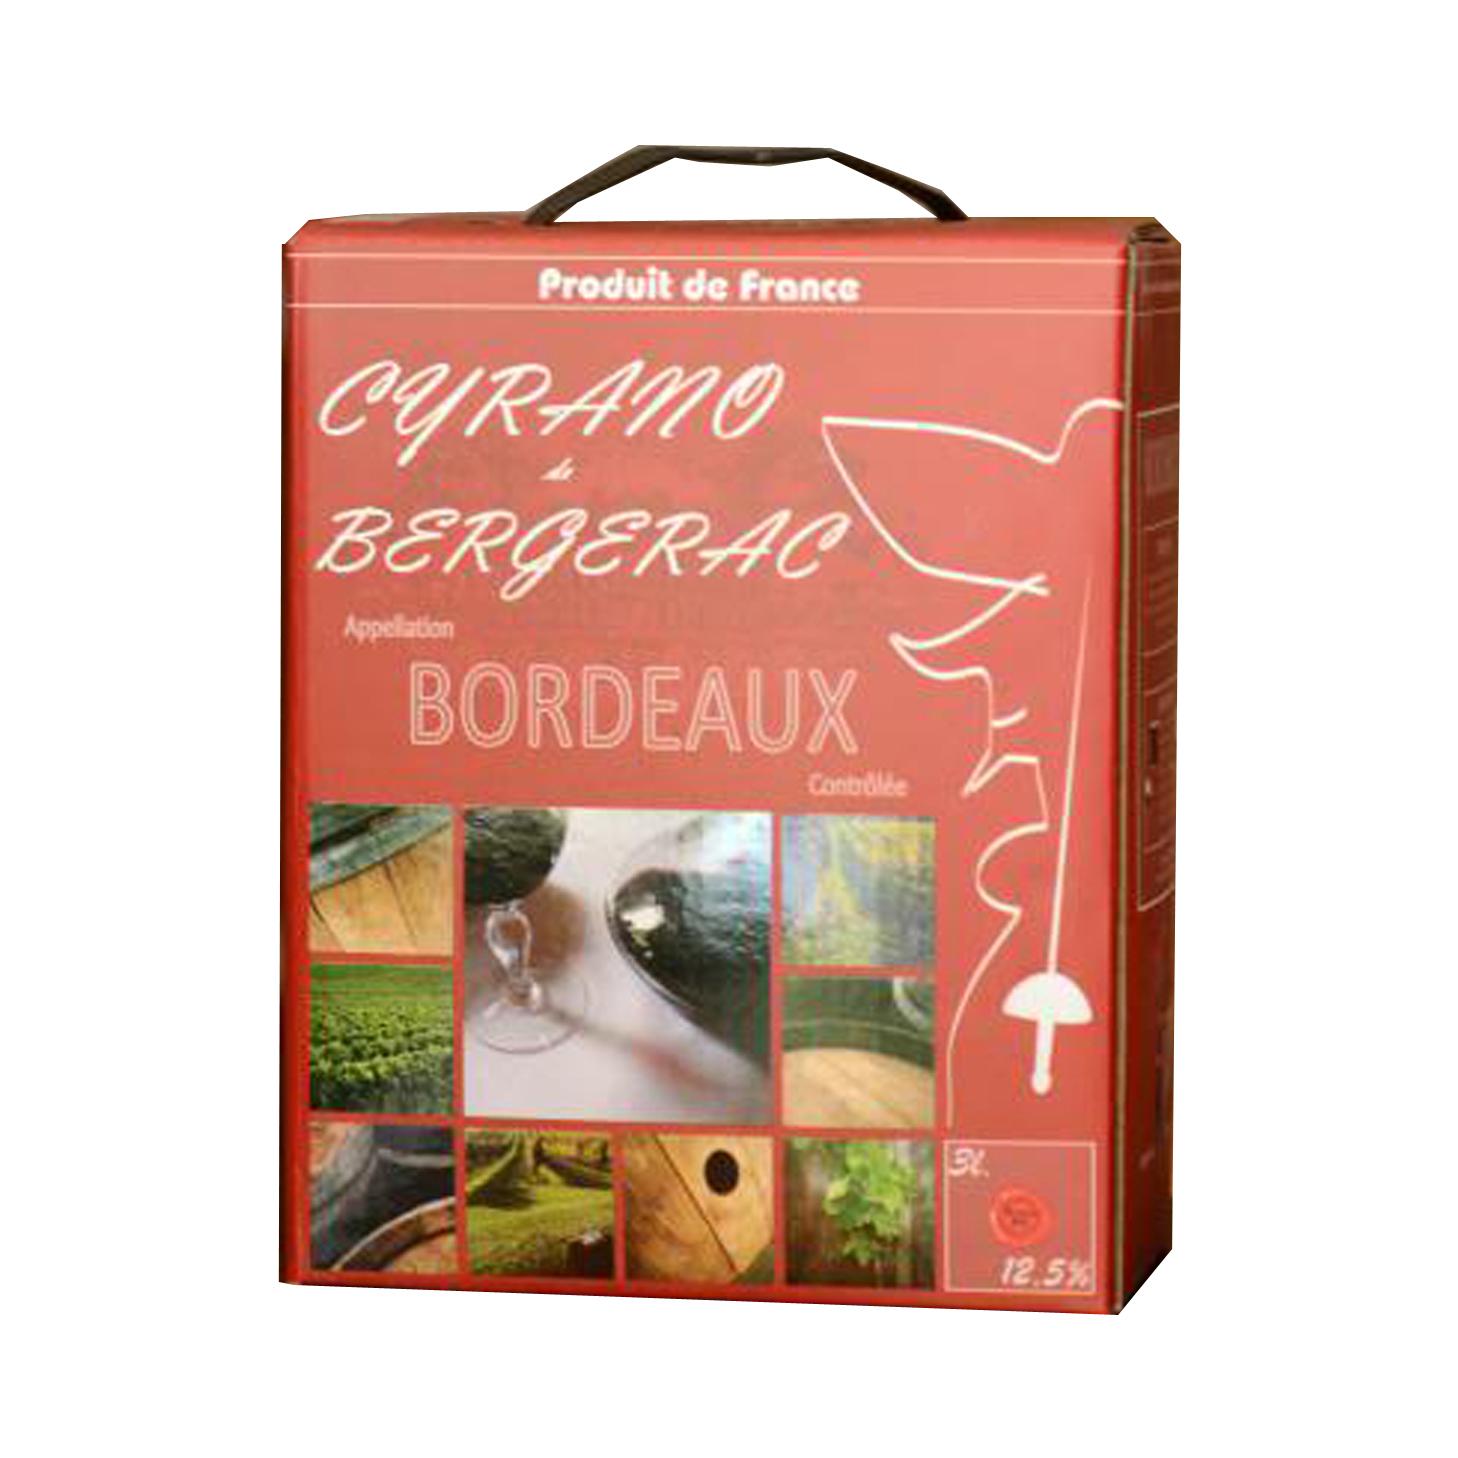 Rượu Bordeaux Cyrano de Begerac